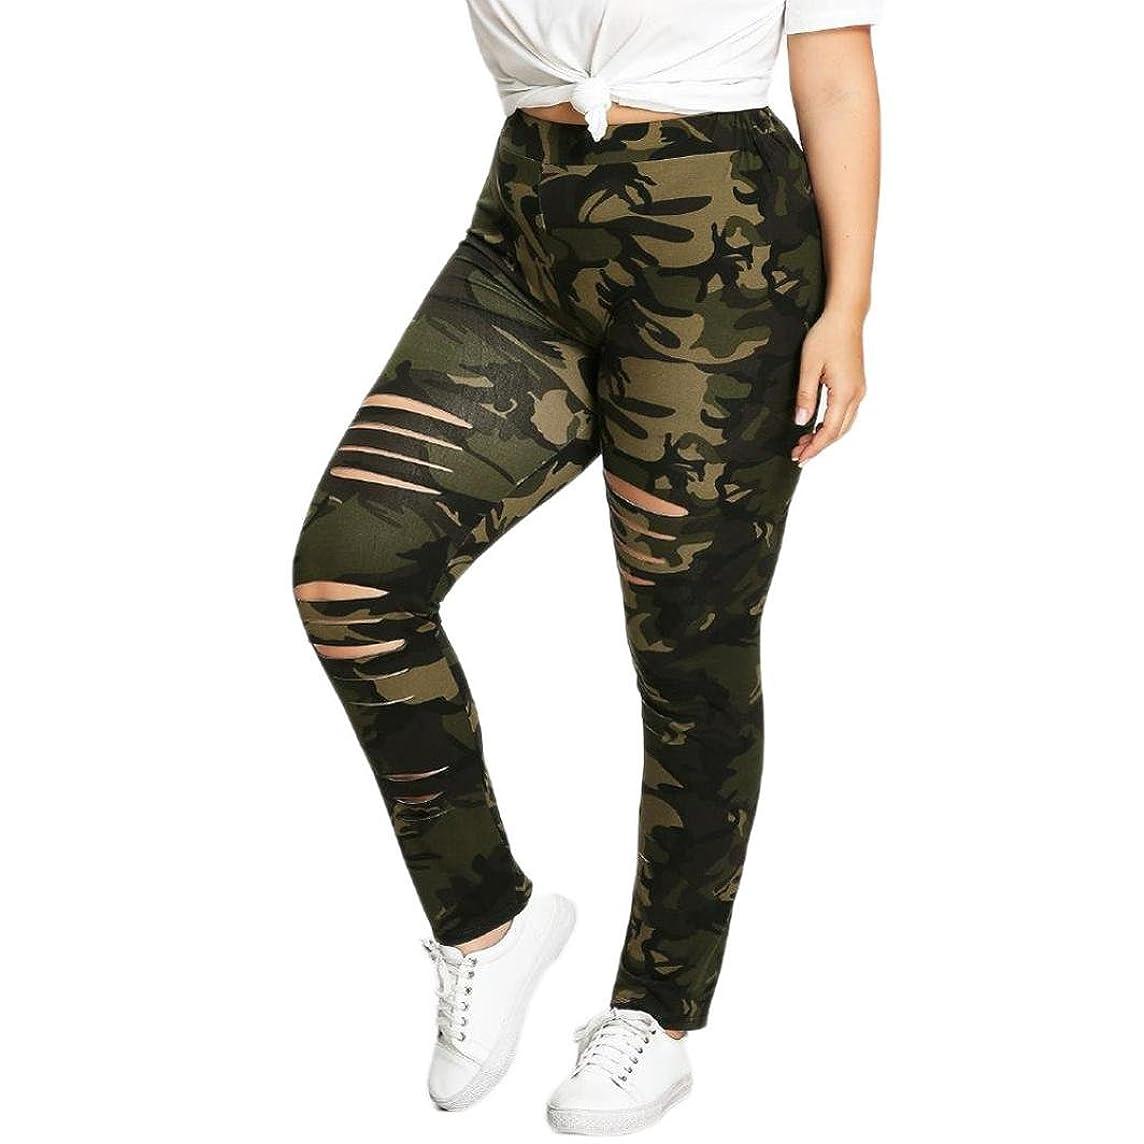 GoodLock Women Camouflage Leggings Fashion Plus Size Trousers Sport Hole Casual Pants